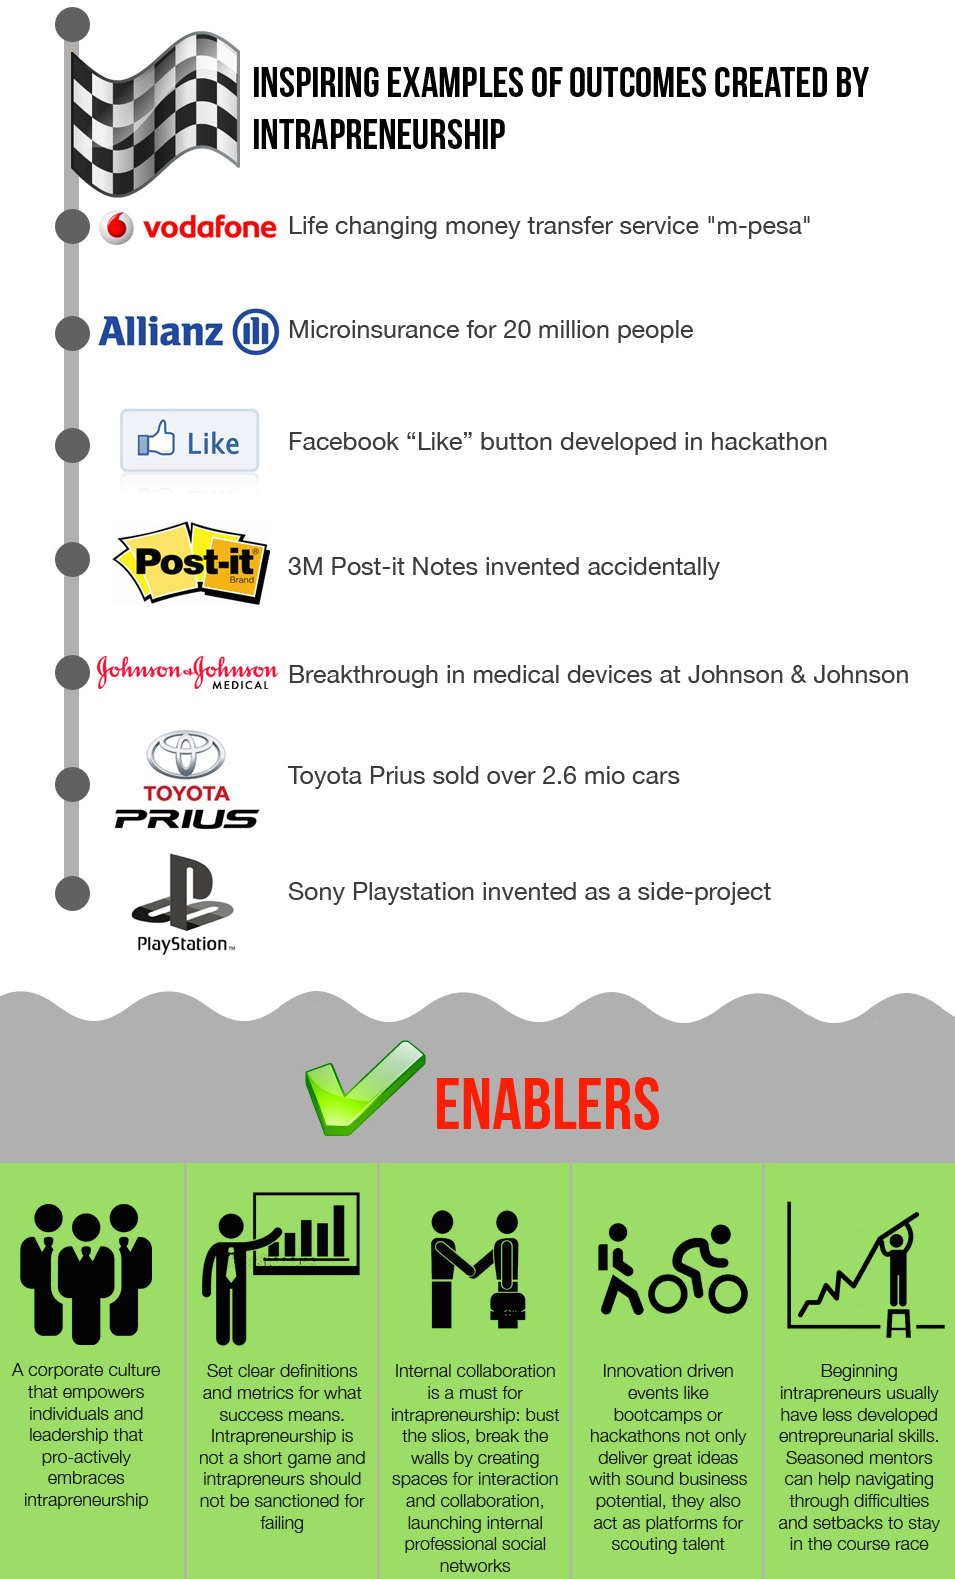 Intrapreneurship: Companies